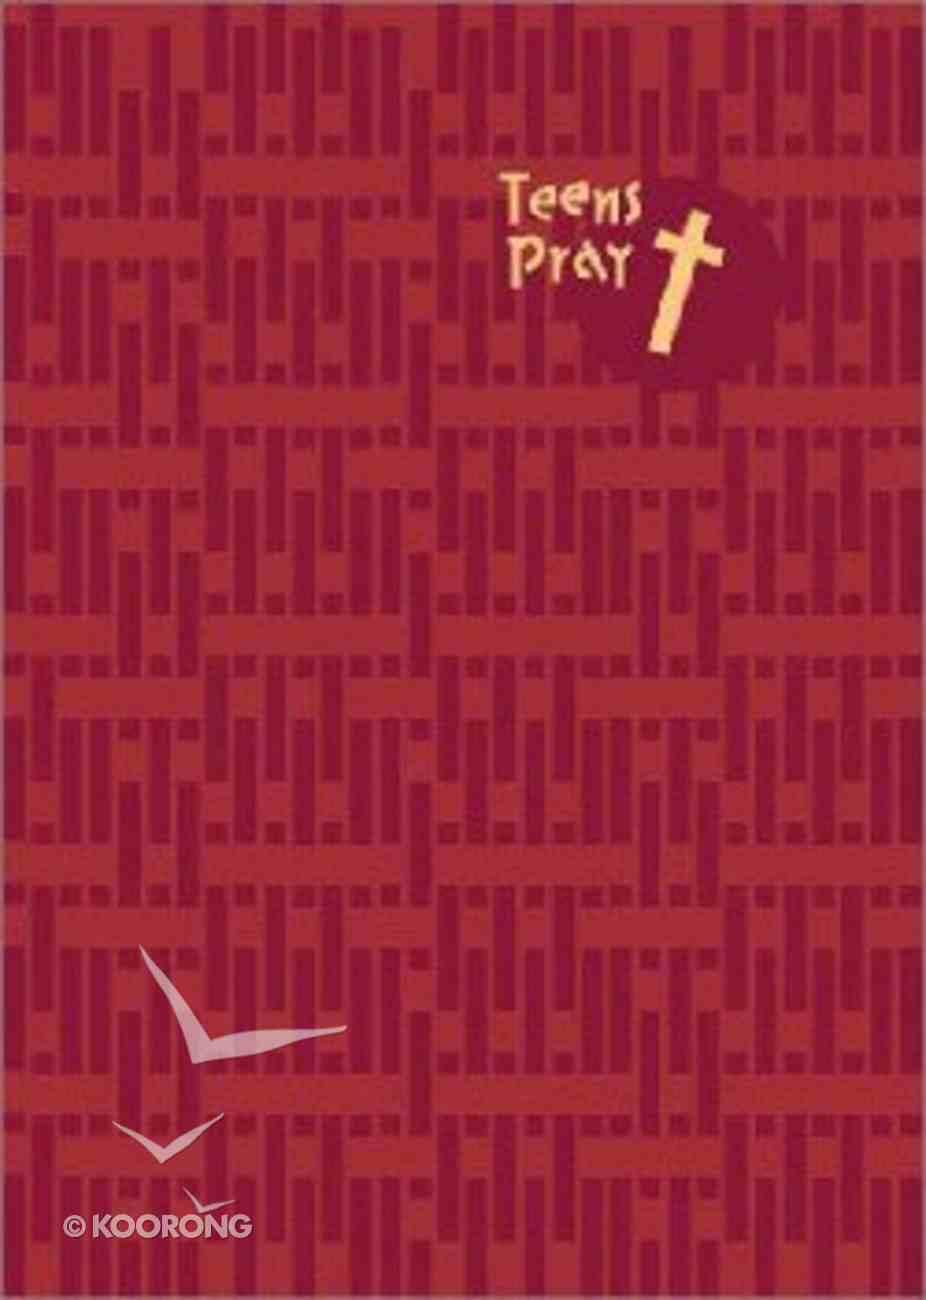 Teens Pray (2002) Hardback